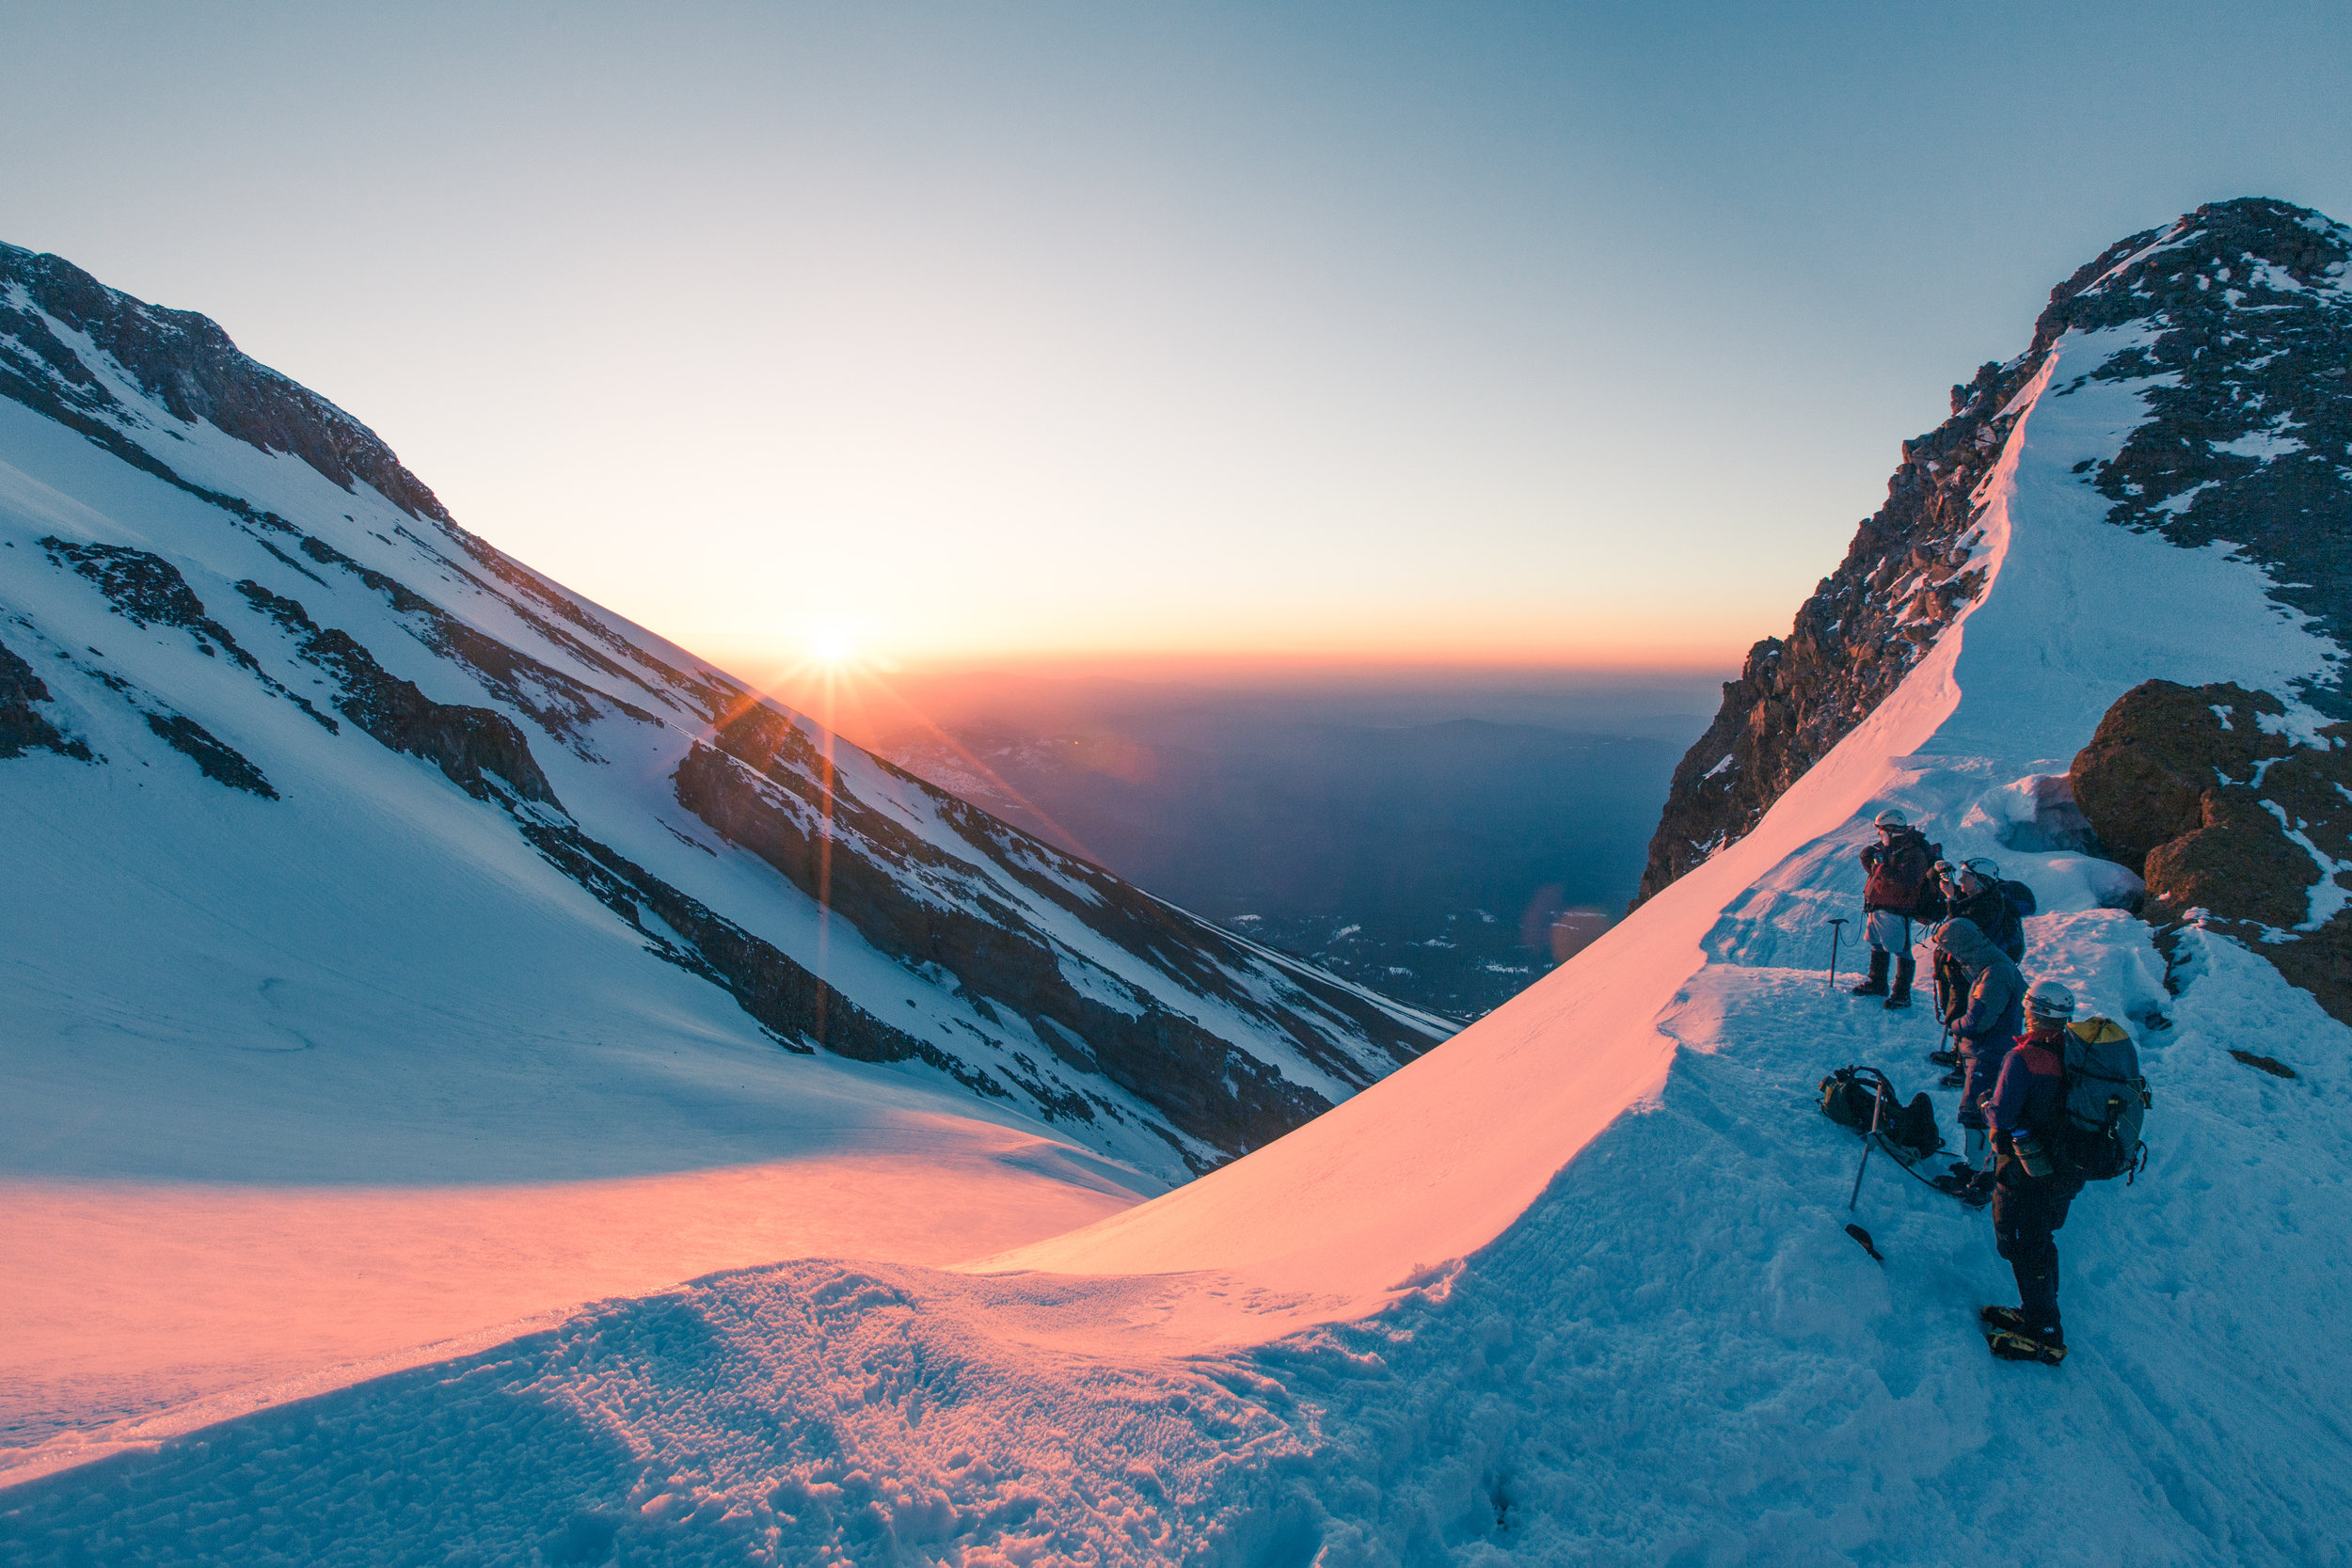 Summit of Mount Shasta, CA